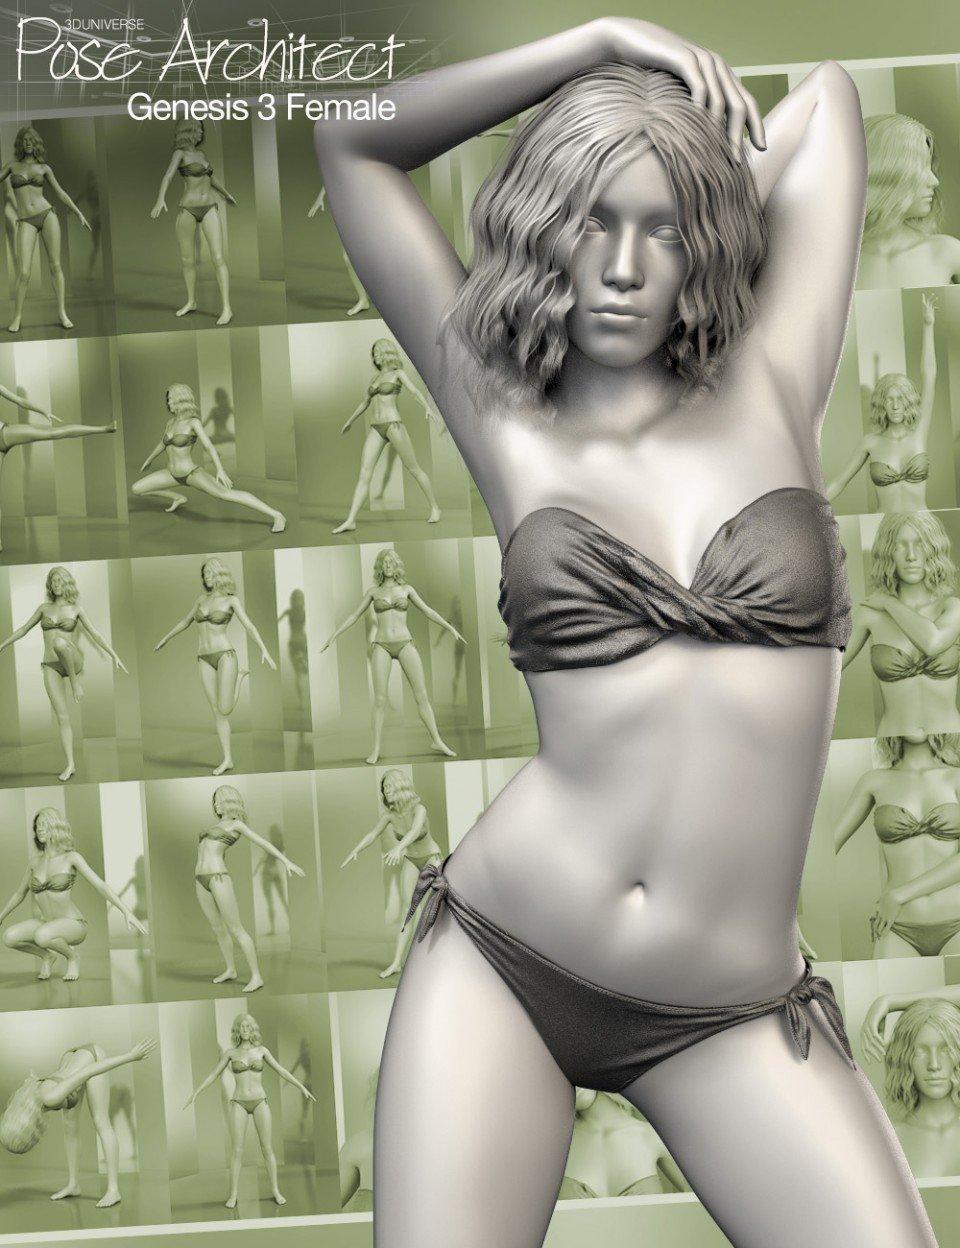 Pose Architect for Genesis 3 Female(s)_DAZ3D下载站